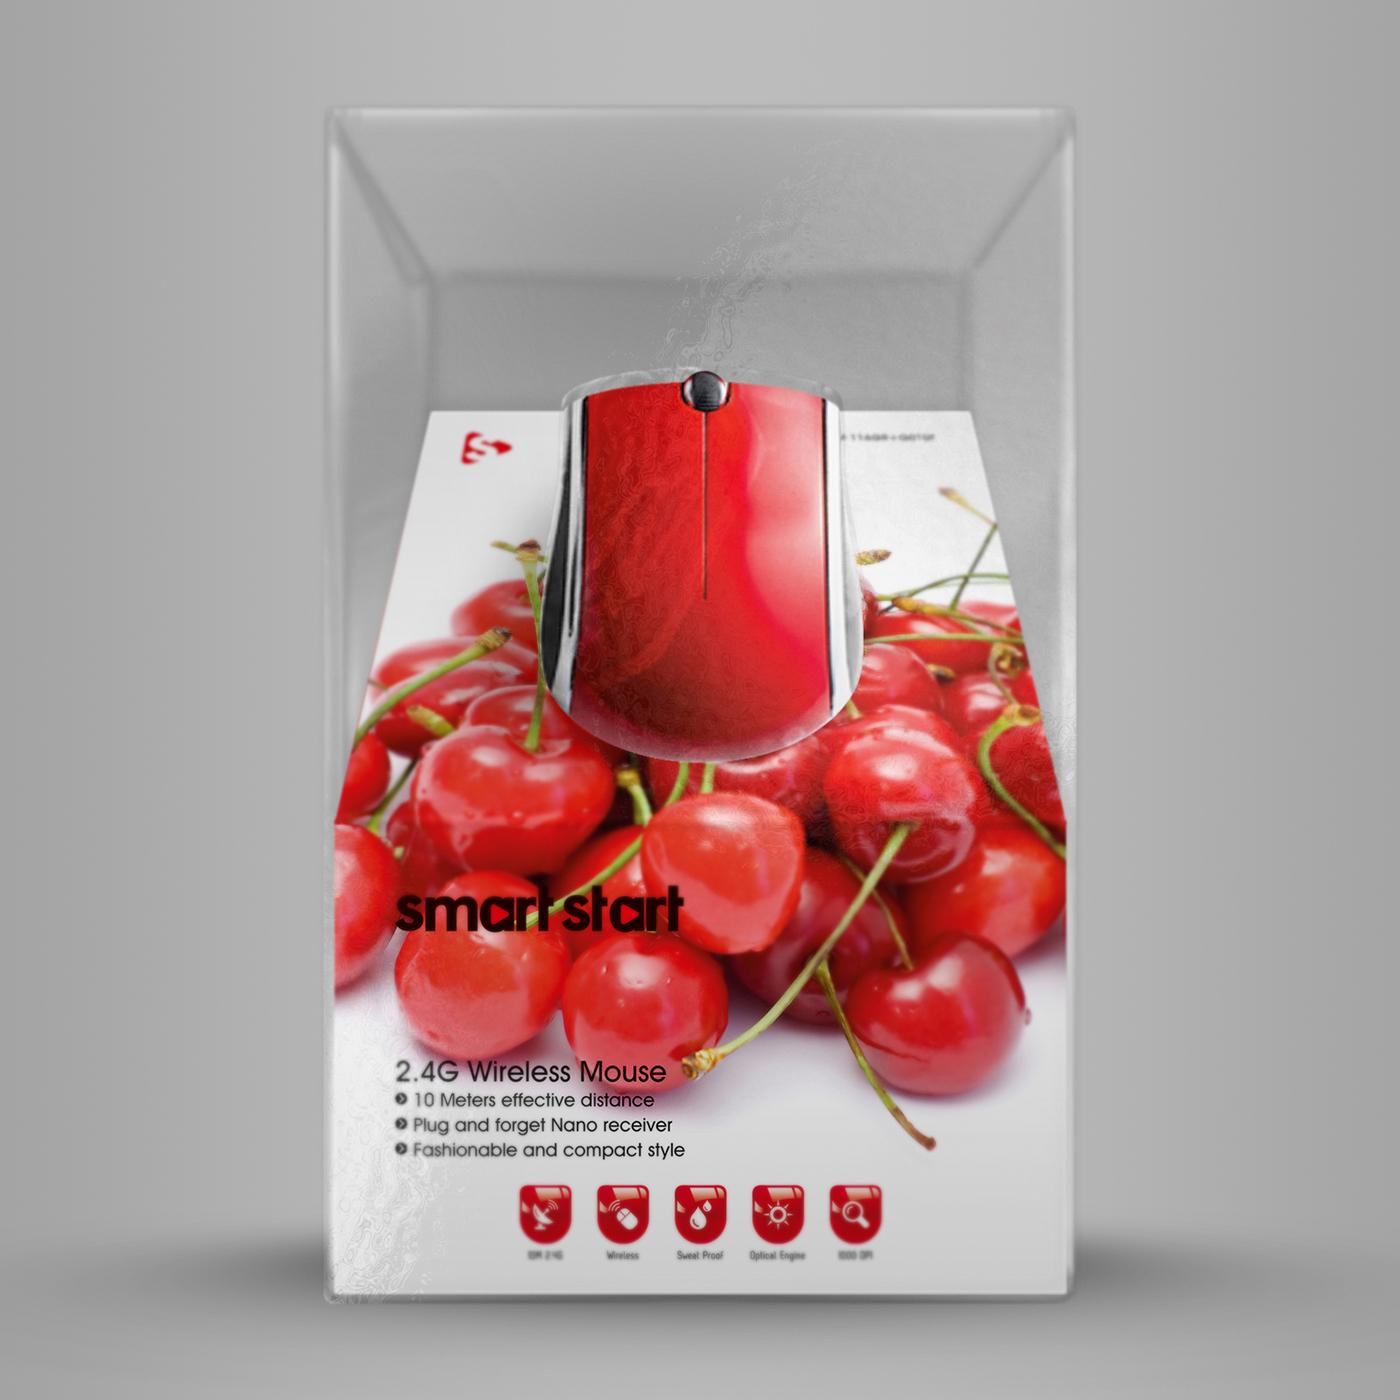 rot schwarz Weiss PC mouse wifi